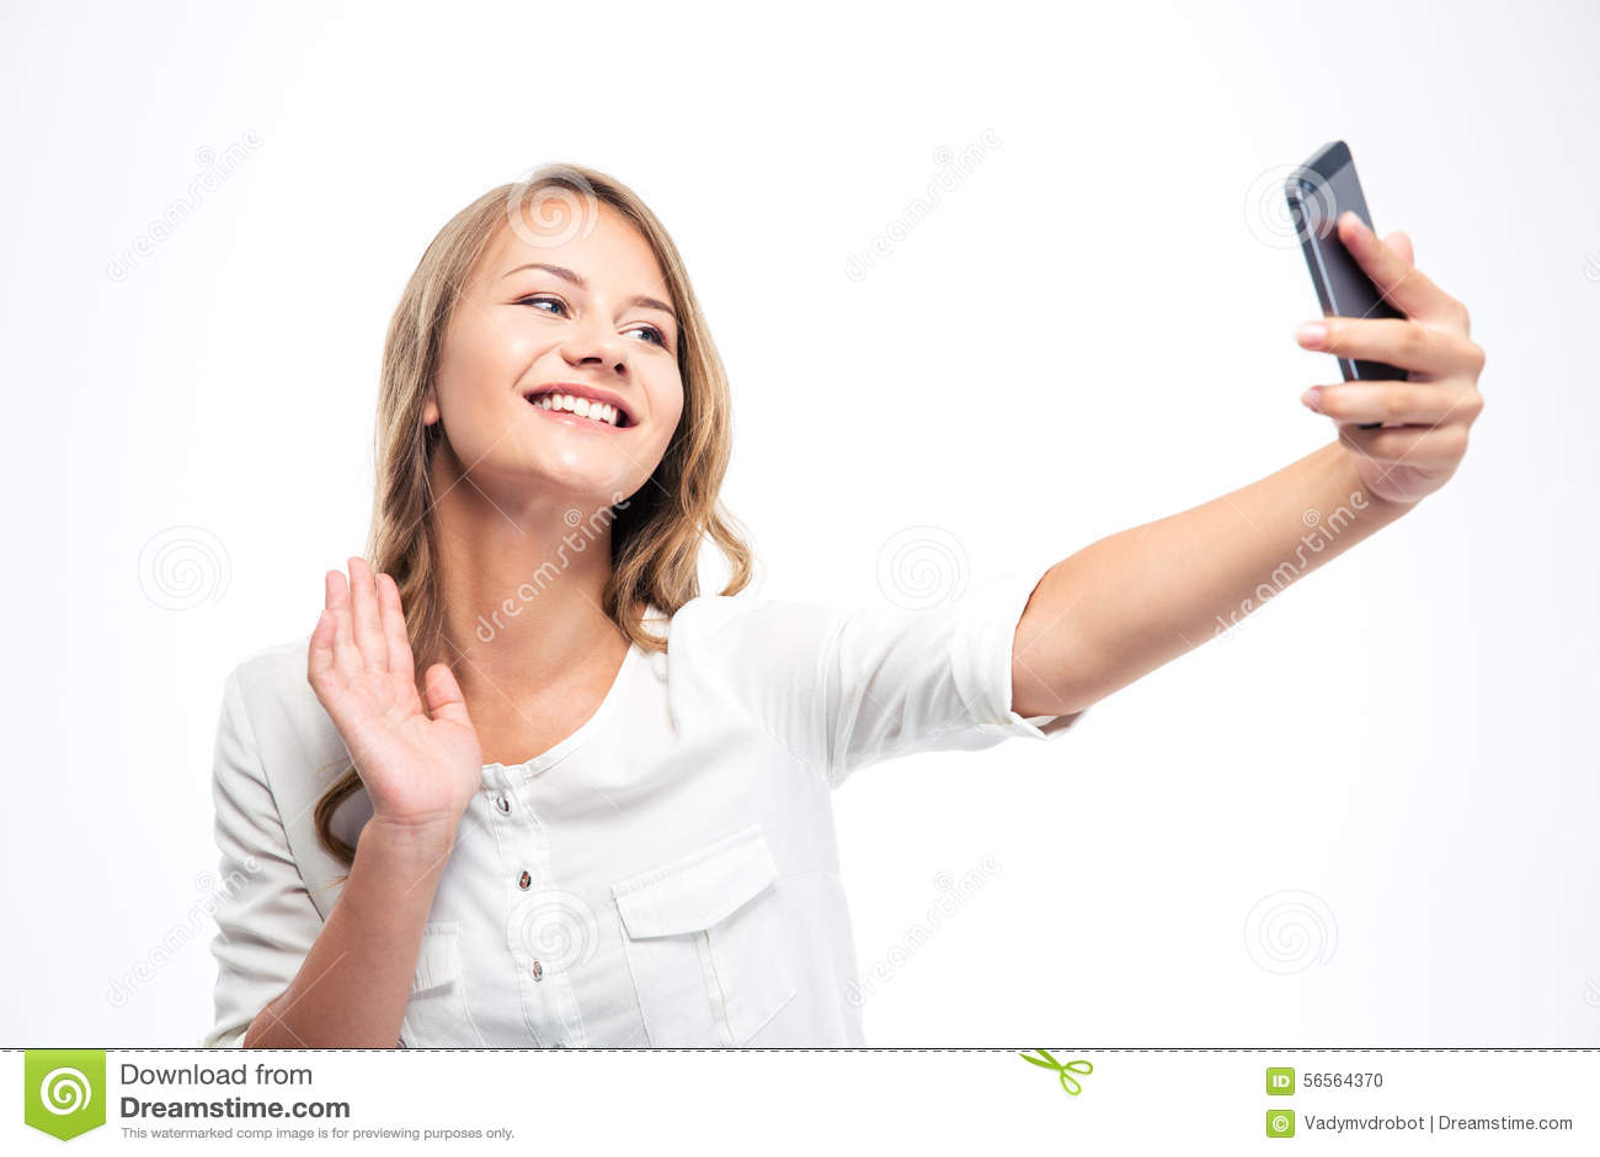 Download Κορίτσι που κάνει Selfie τη φωτογραφία κυματίζοντας το φοίνικα Στοκ Εικόνες - εικόνα από πορτρέτο, πρόσωπο: 56564370